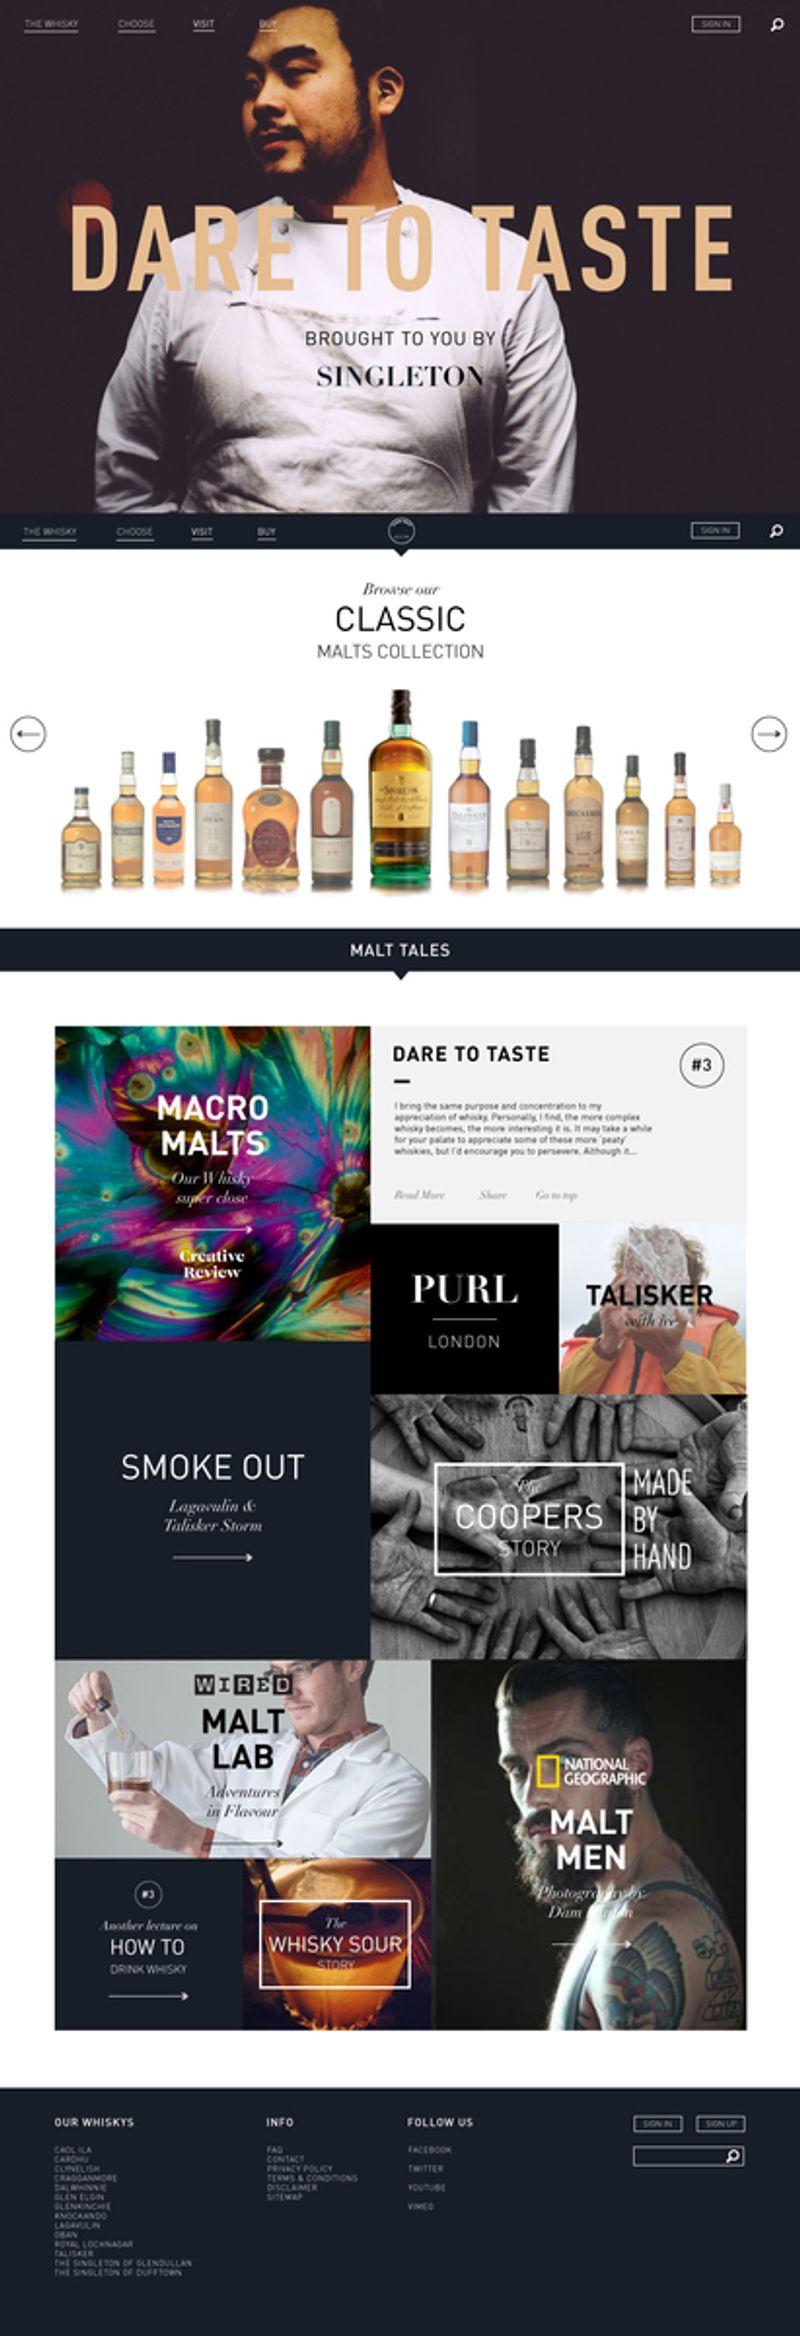 Malts.com redesign